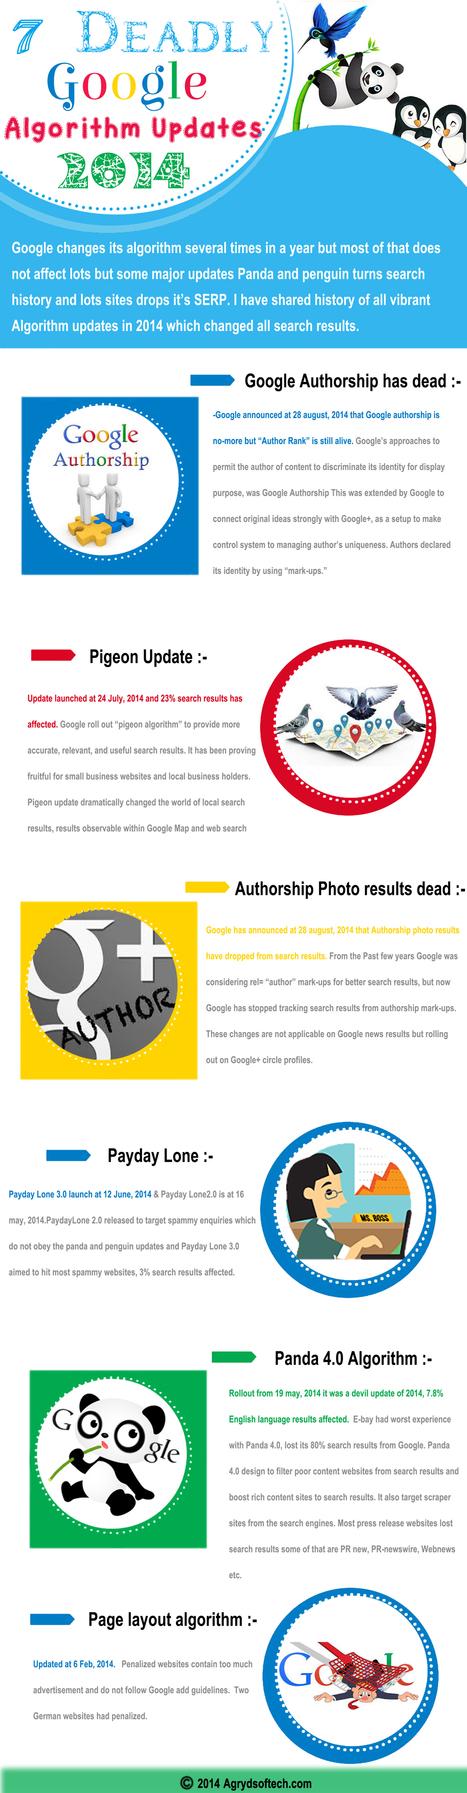 7 Deadly Google algorithm updates - 2014 | Home Renovation Specialist | Scoop.it